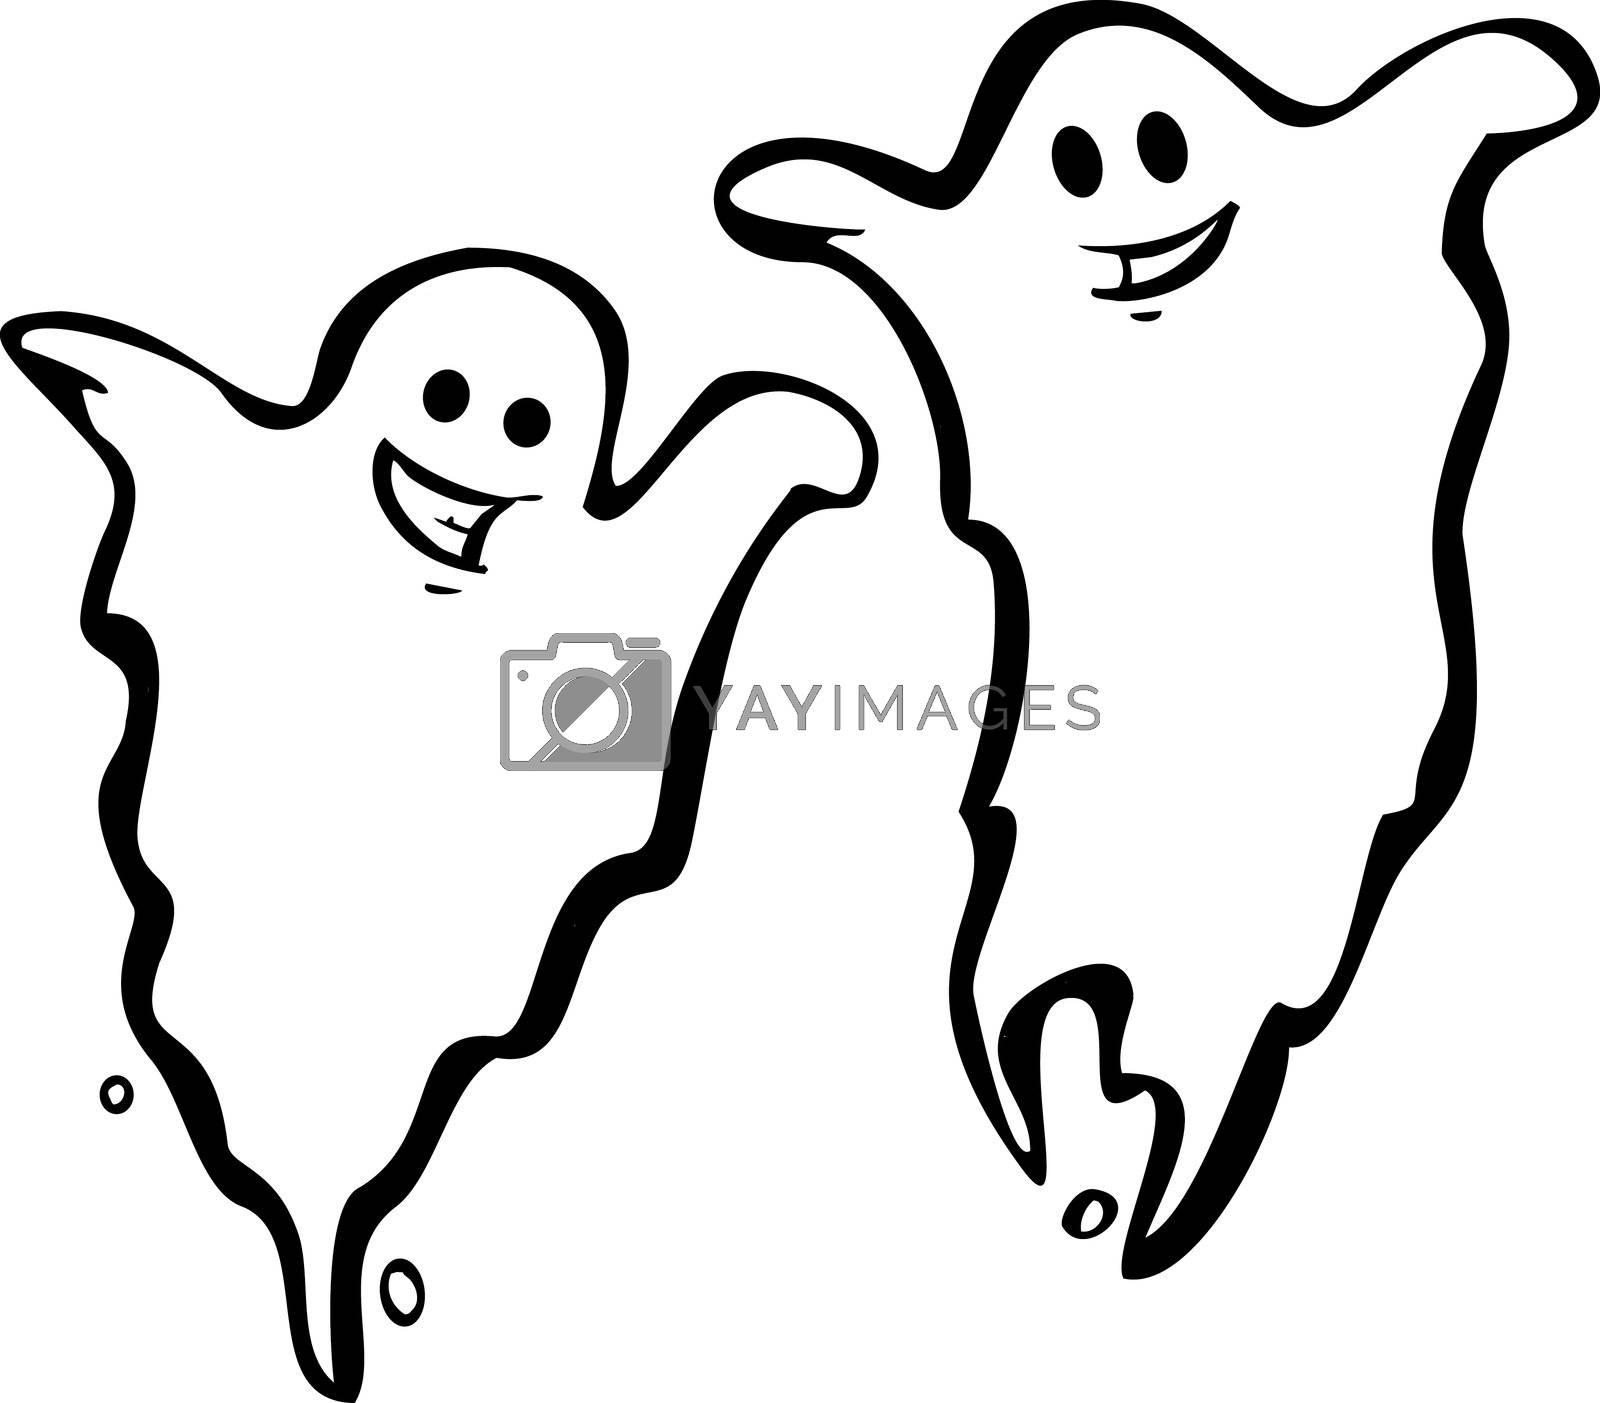 A Pair of fun Halloween Night Ghosts.